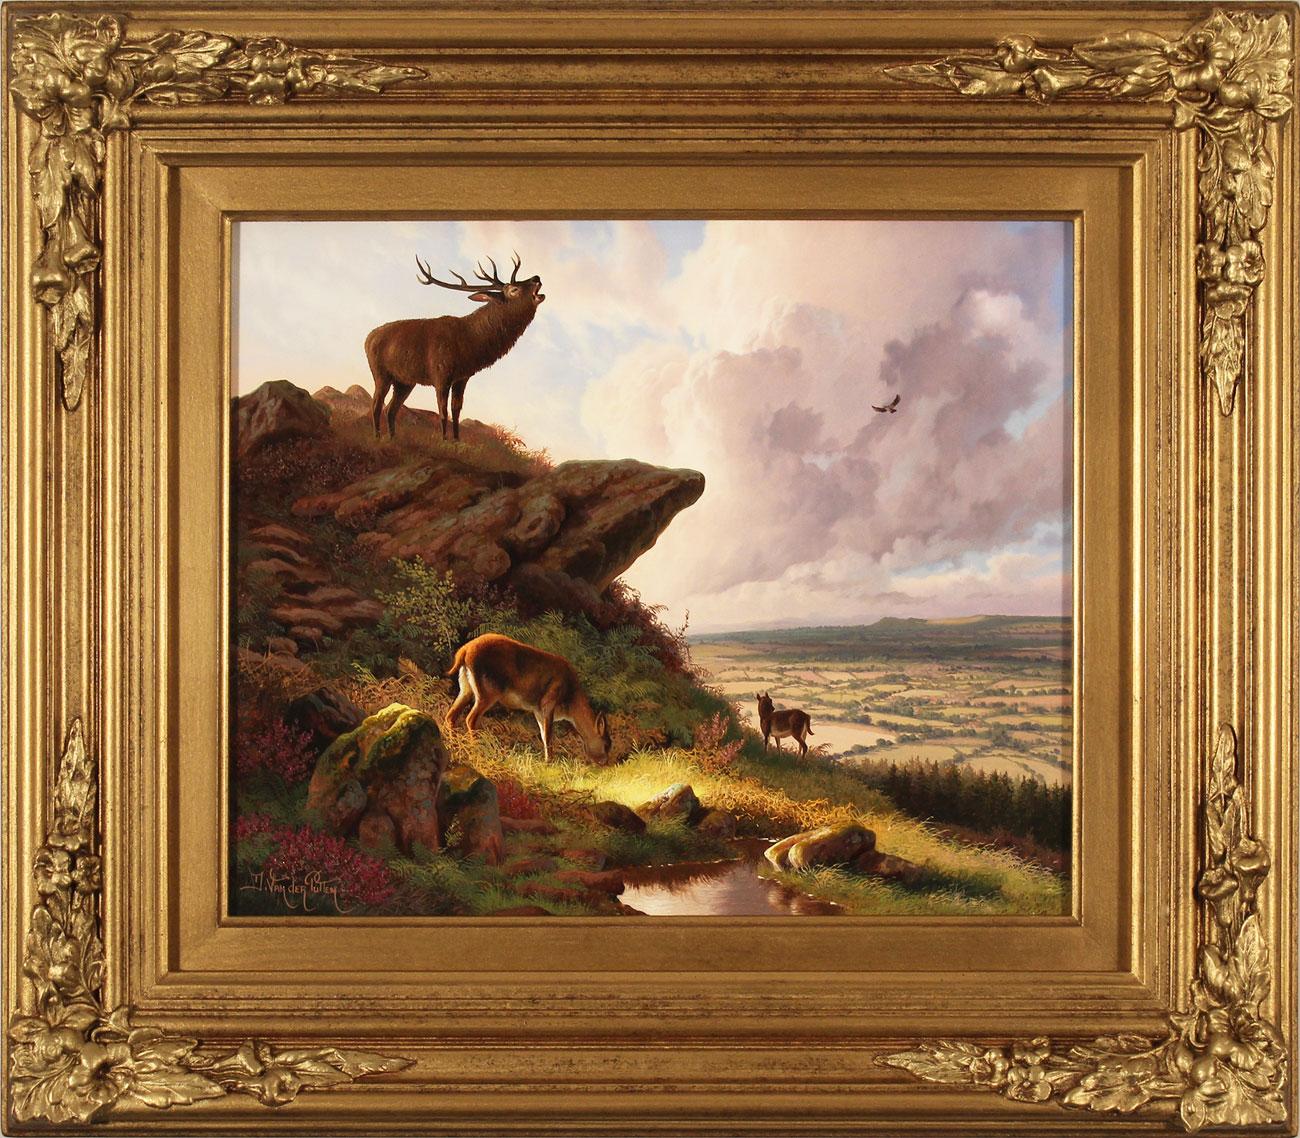 Daniel Van Der Putten, Original oil painting on panel, Cleveland Way, National Trail, Yorkshire, click to enlarge